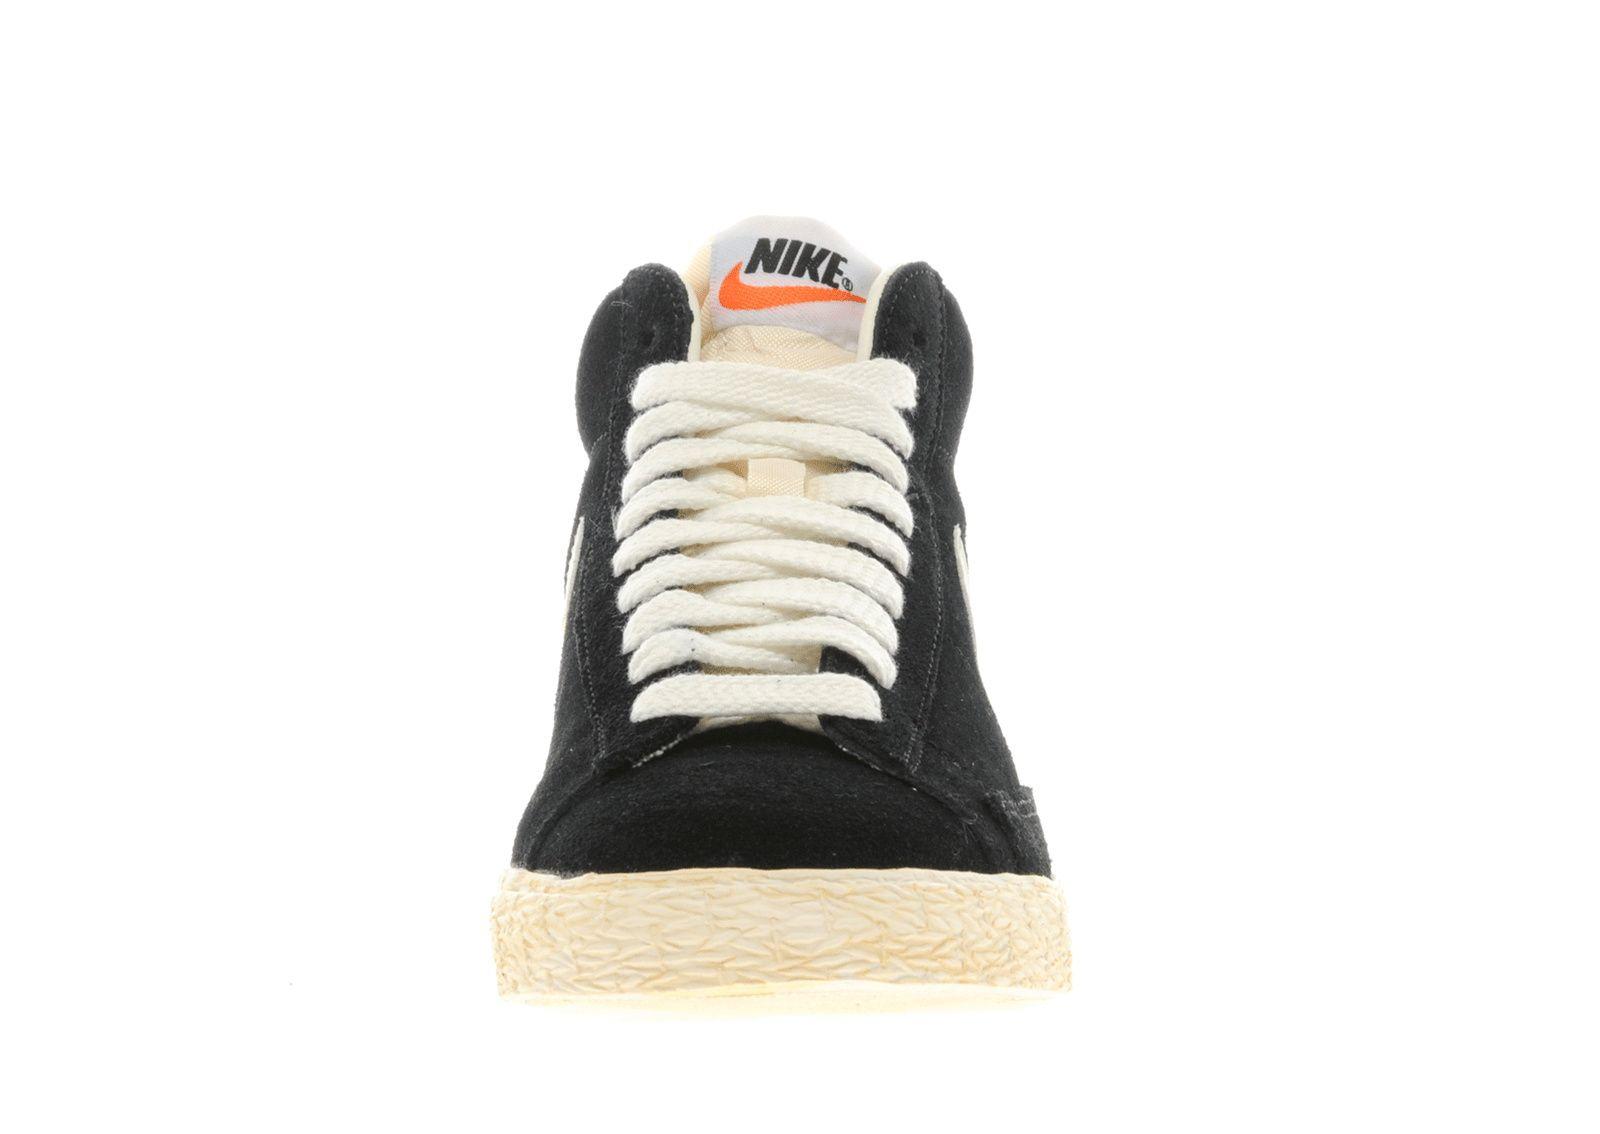 Nike Blazer Hi Vintage Suede